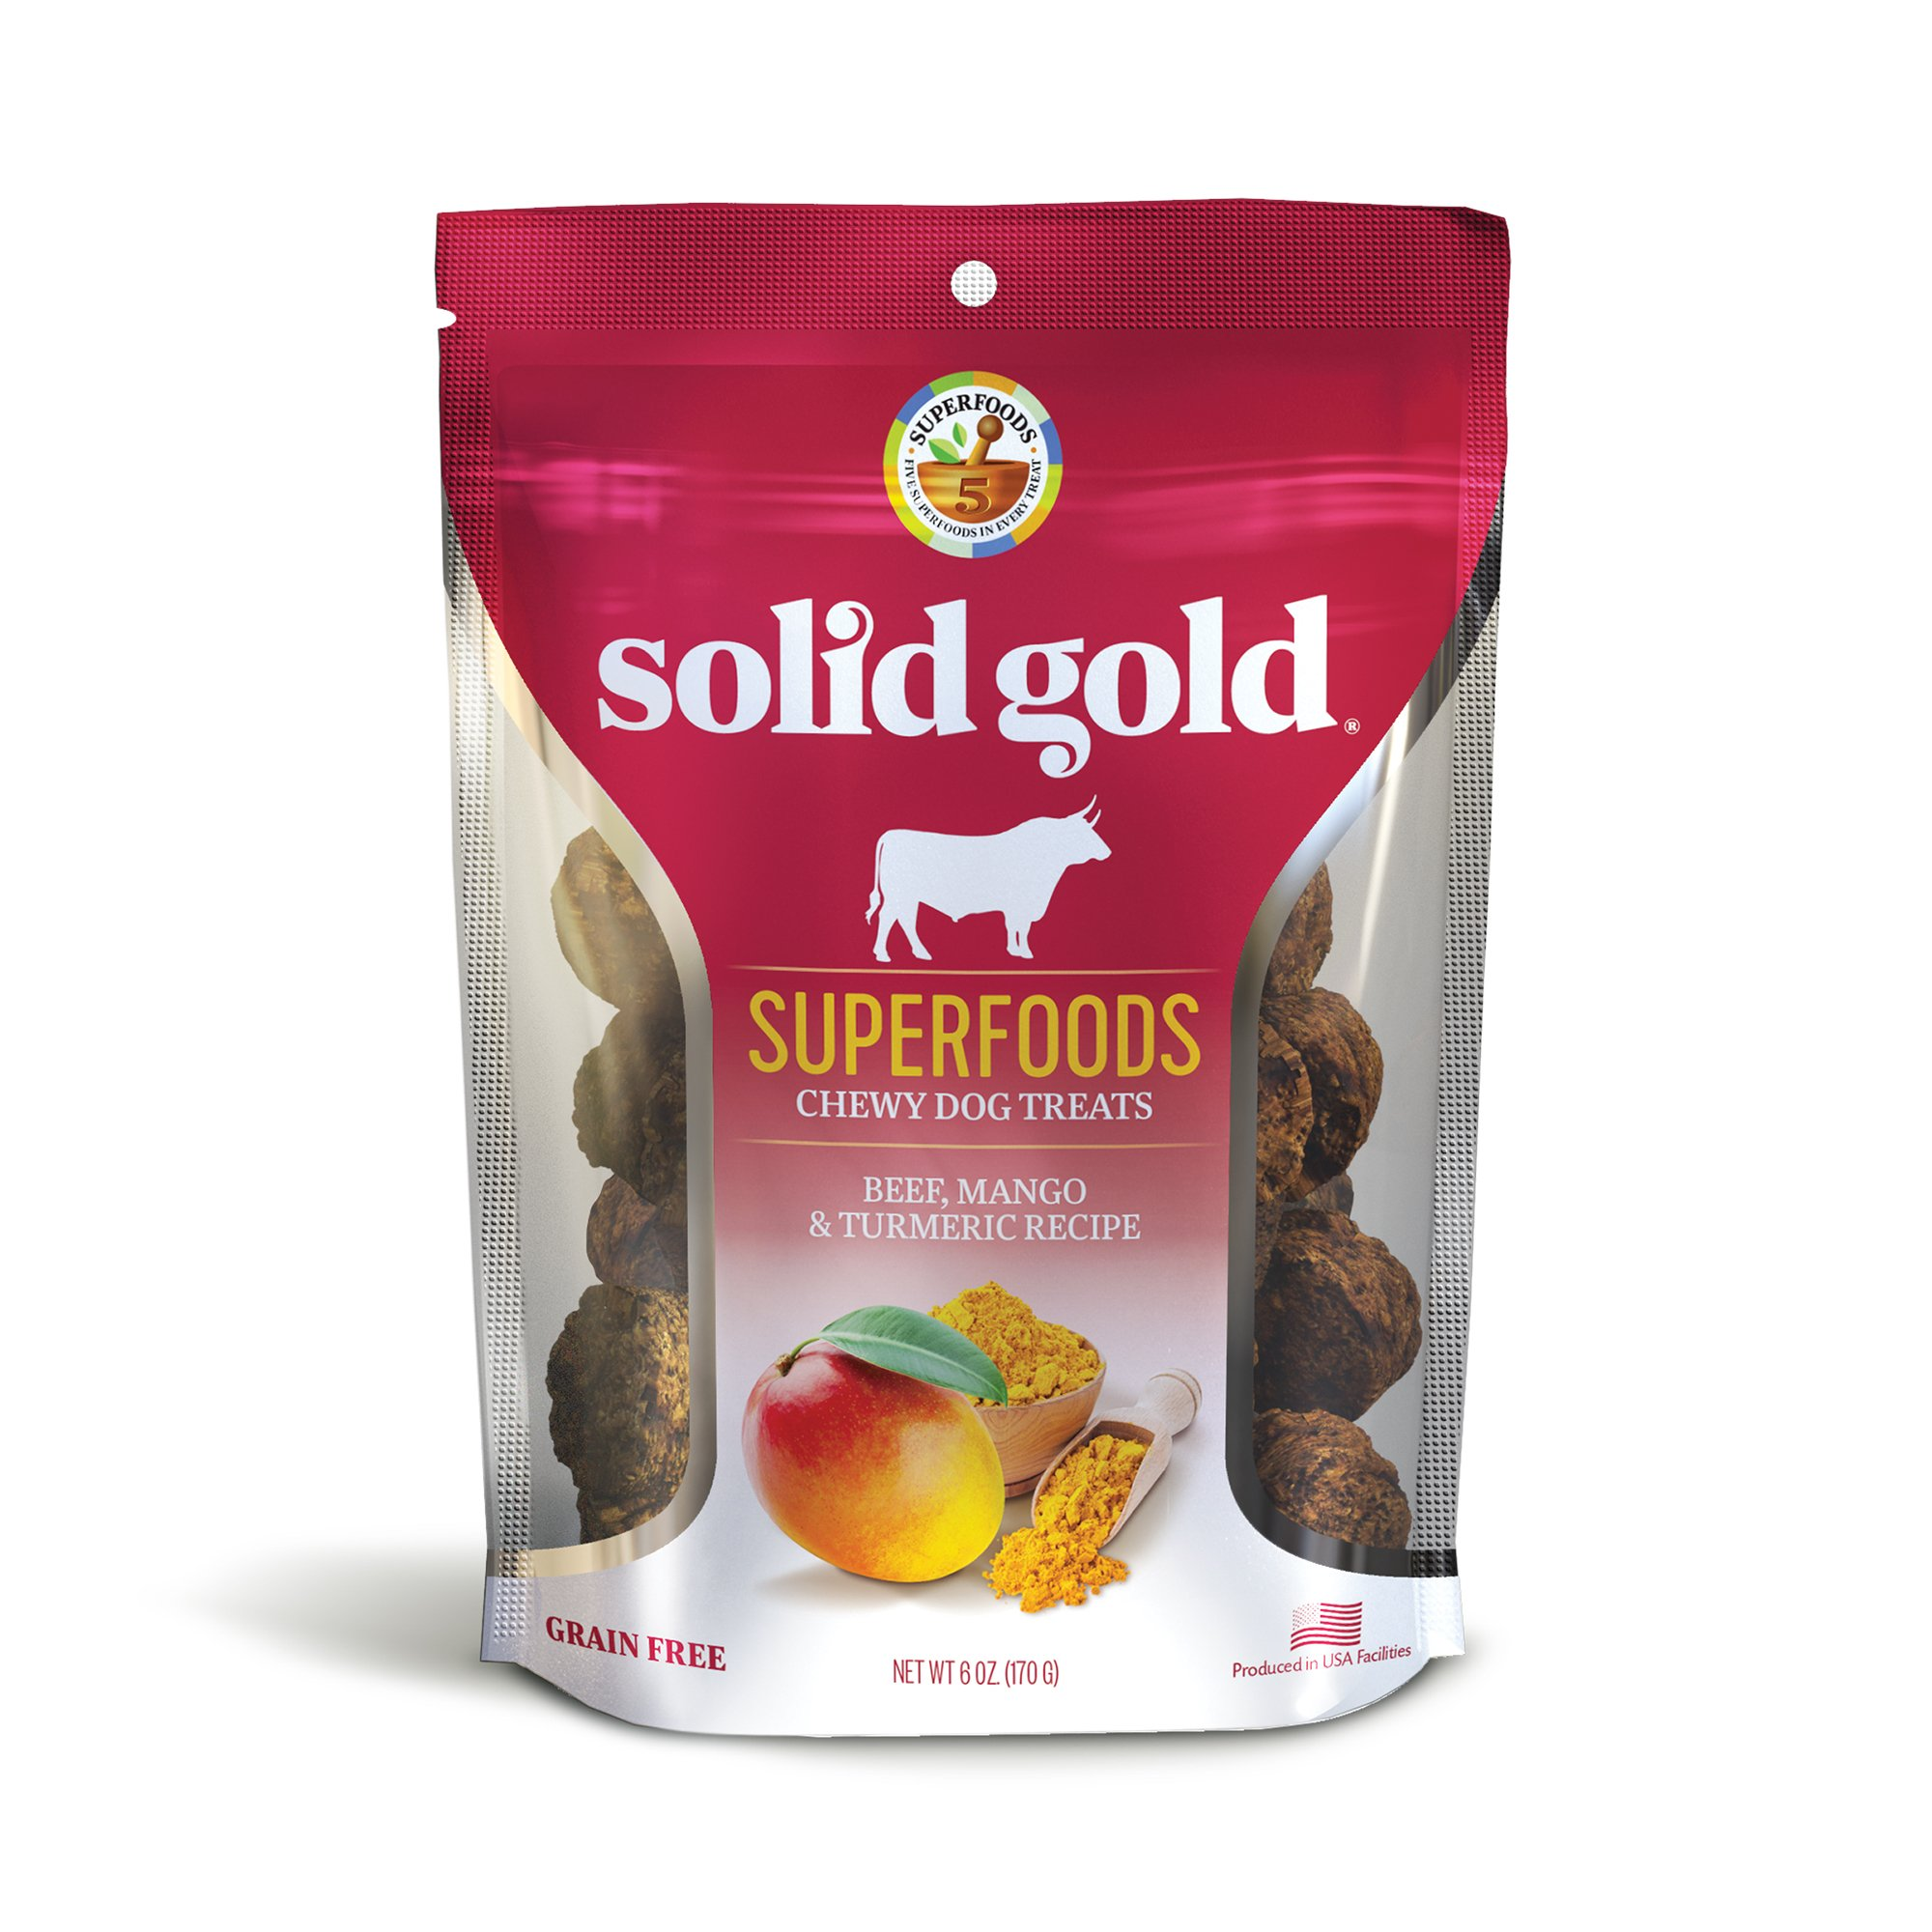 Solid Gold Superfood Dog Treats; Grain Free Beef, Mango & Turmeric, 6Oz